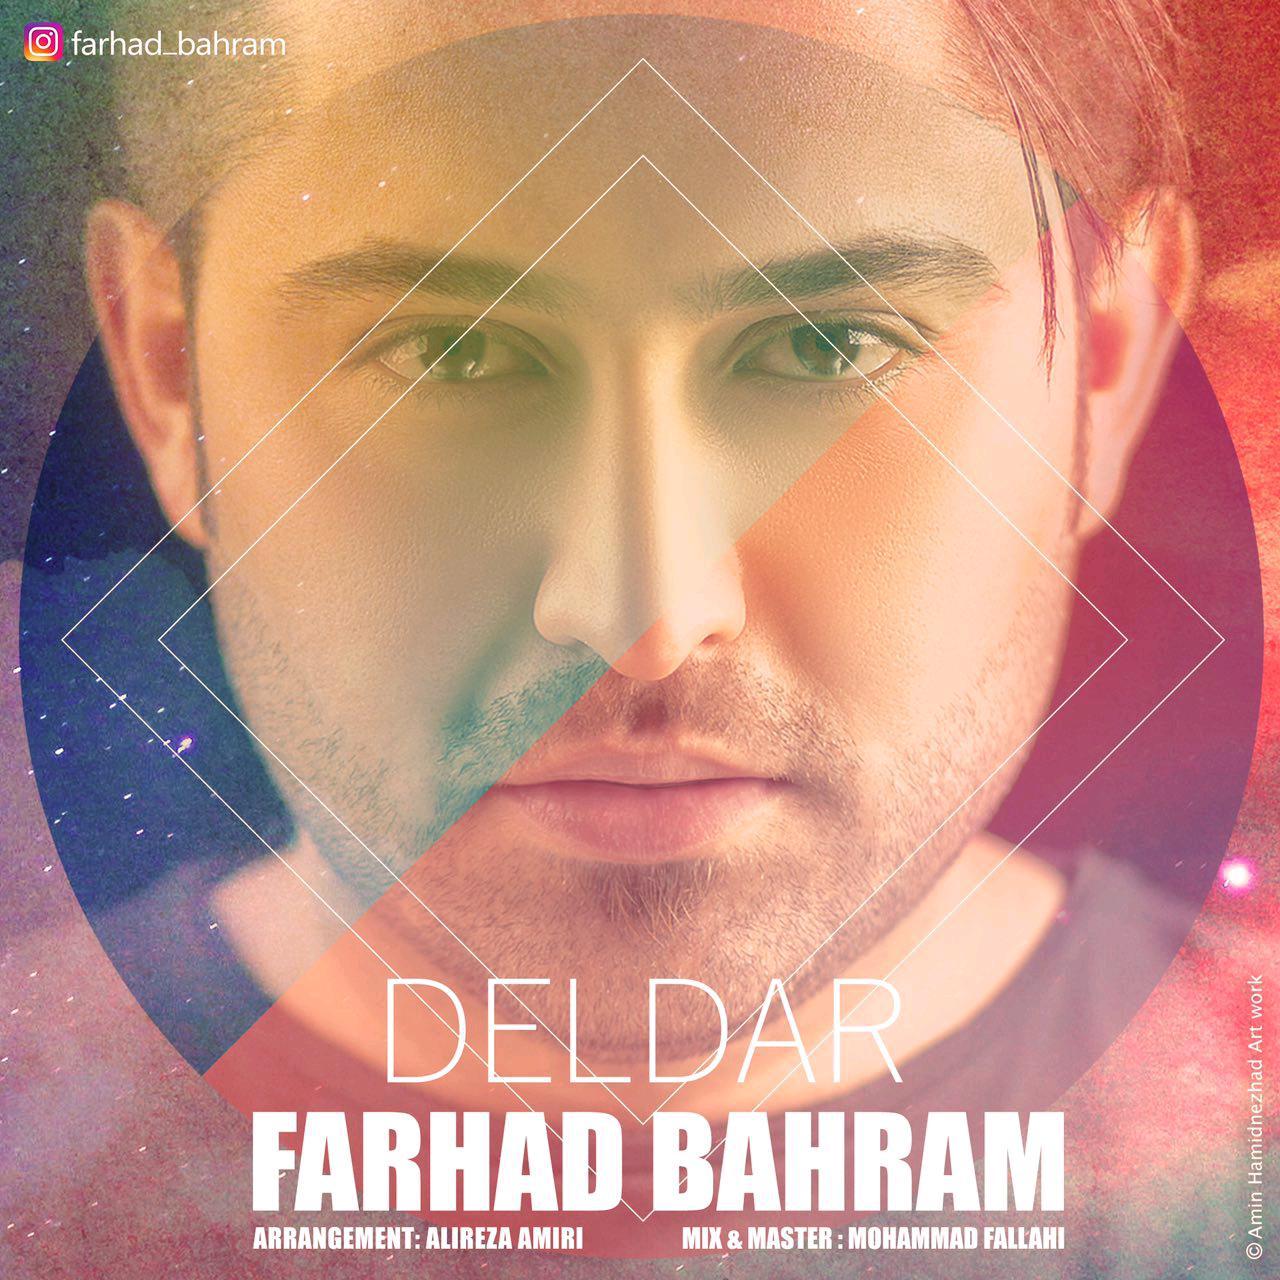 Farhad Bahram – Deldar